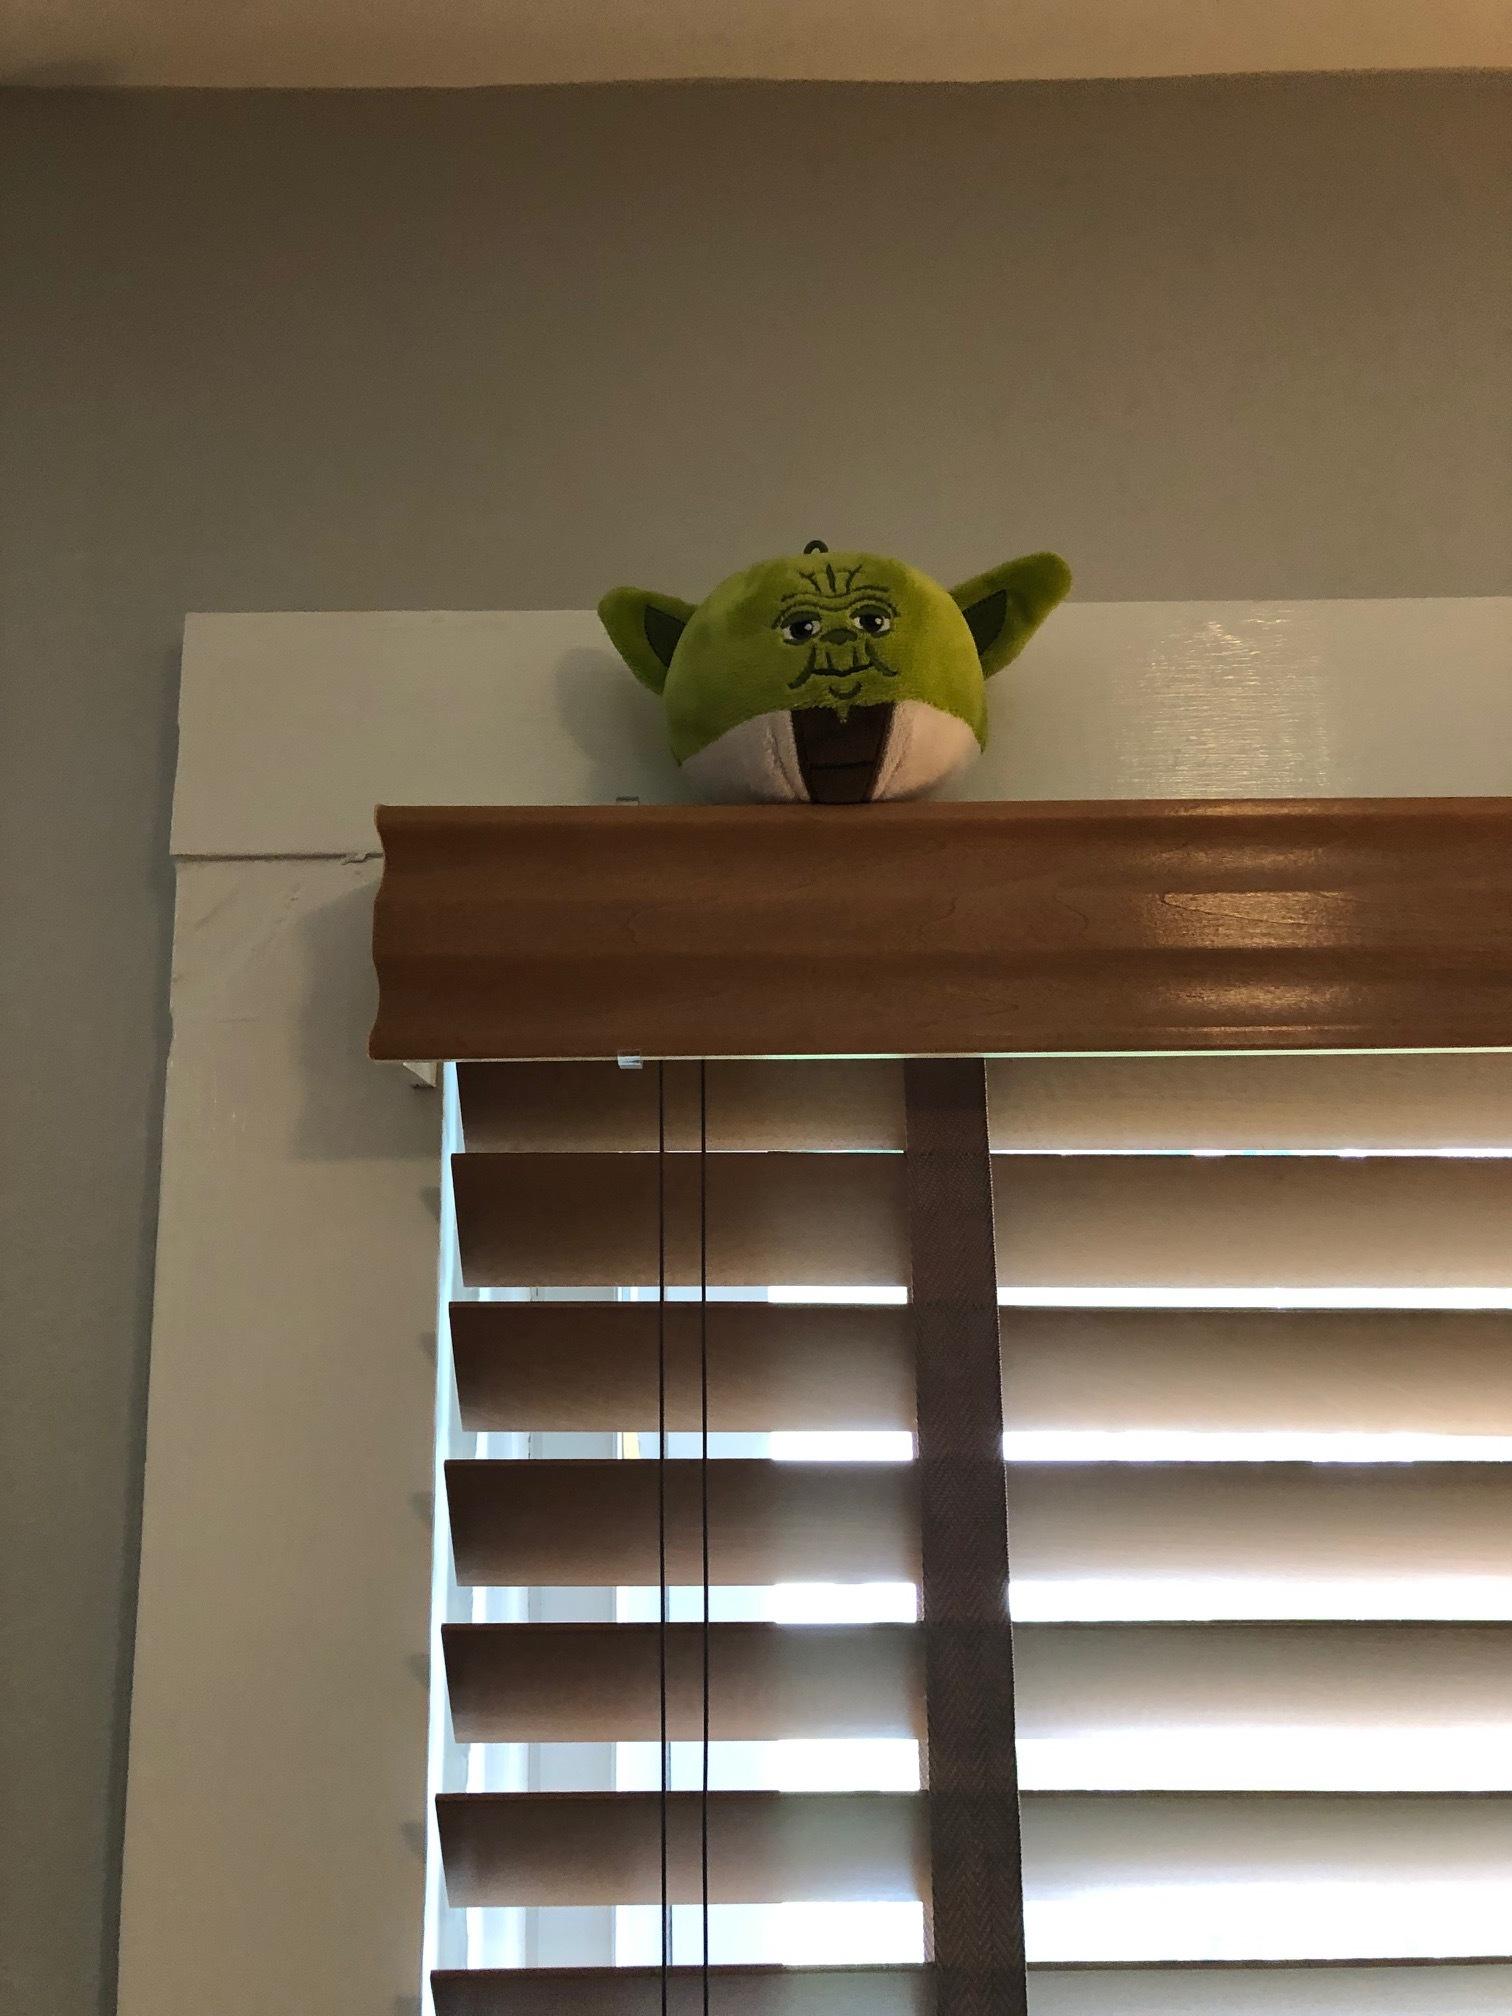 Yoda over a window